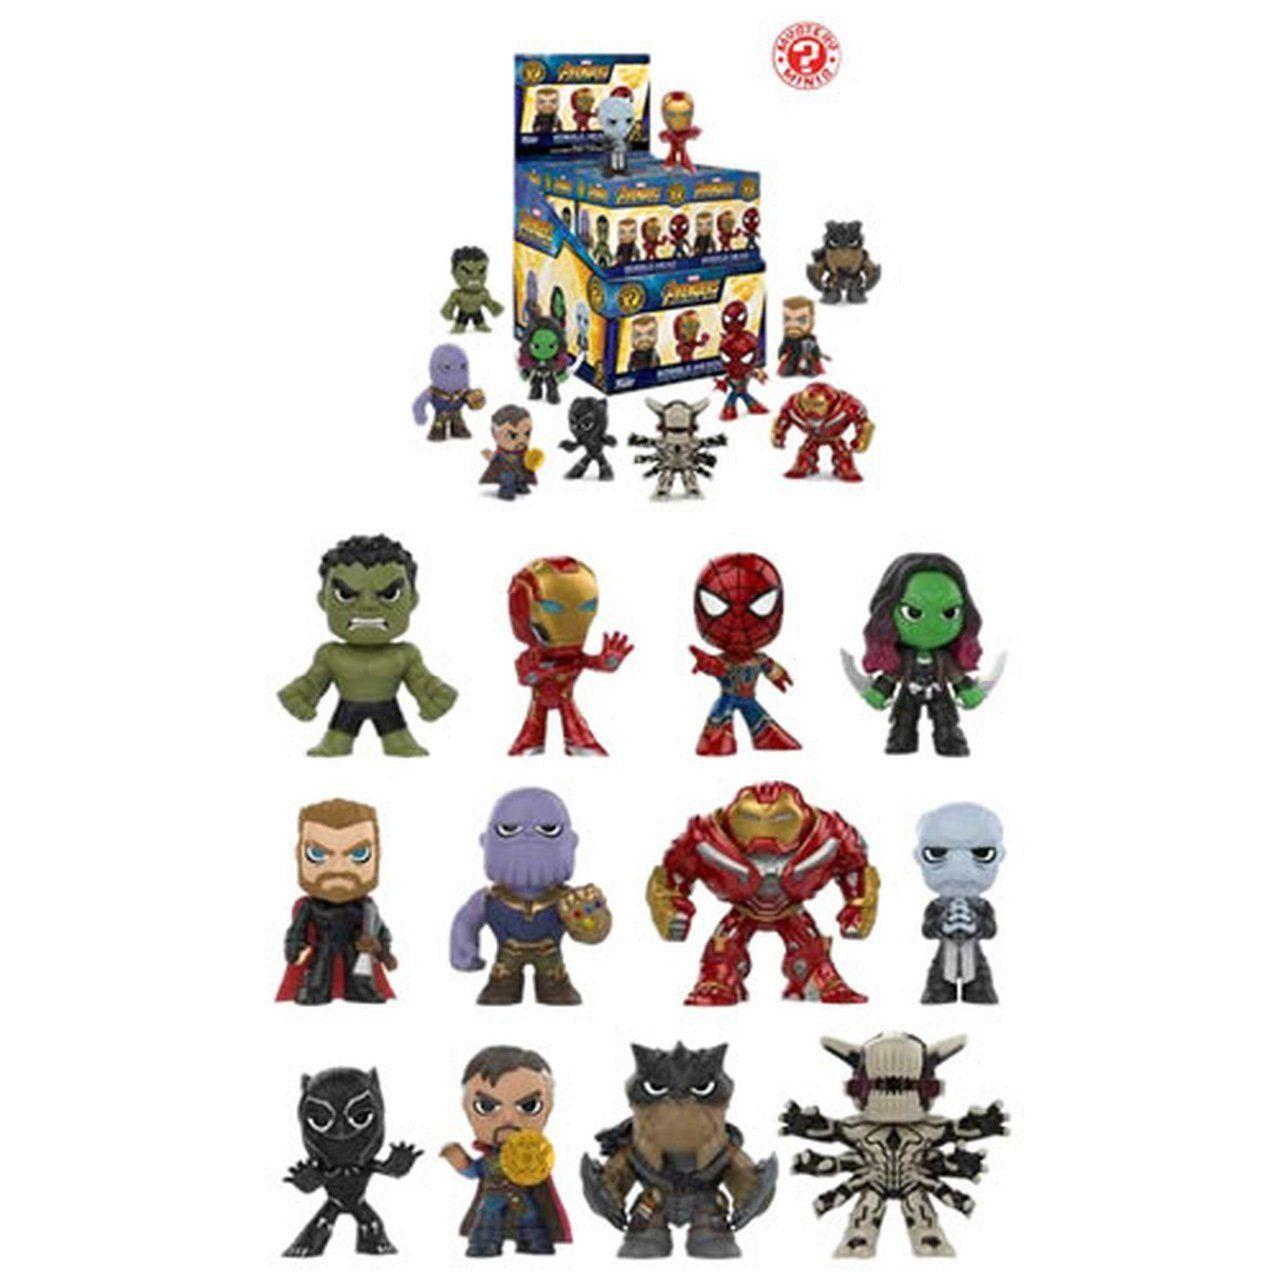 PRÉ VENDA: Mystery Minis! Guerra Infinita (Avengers 3 Infinity War) - Funko